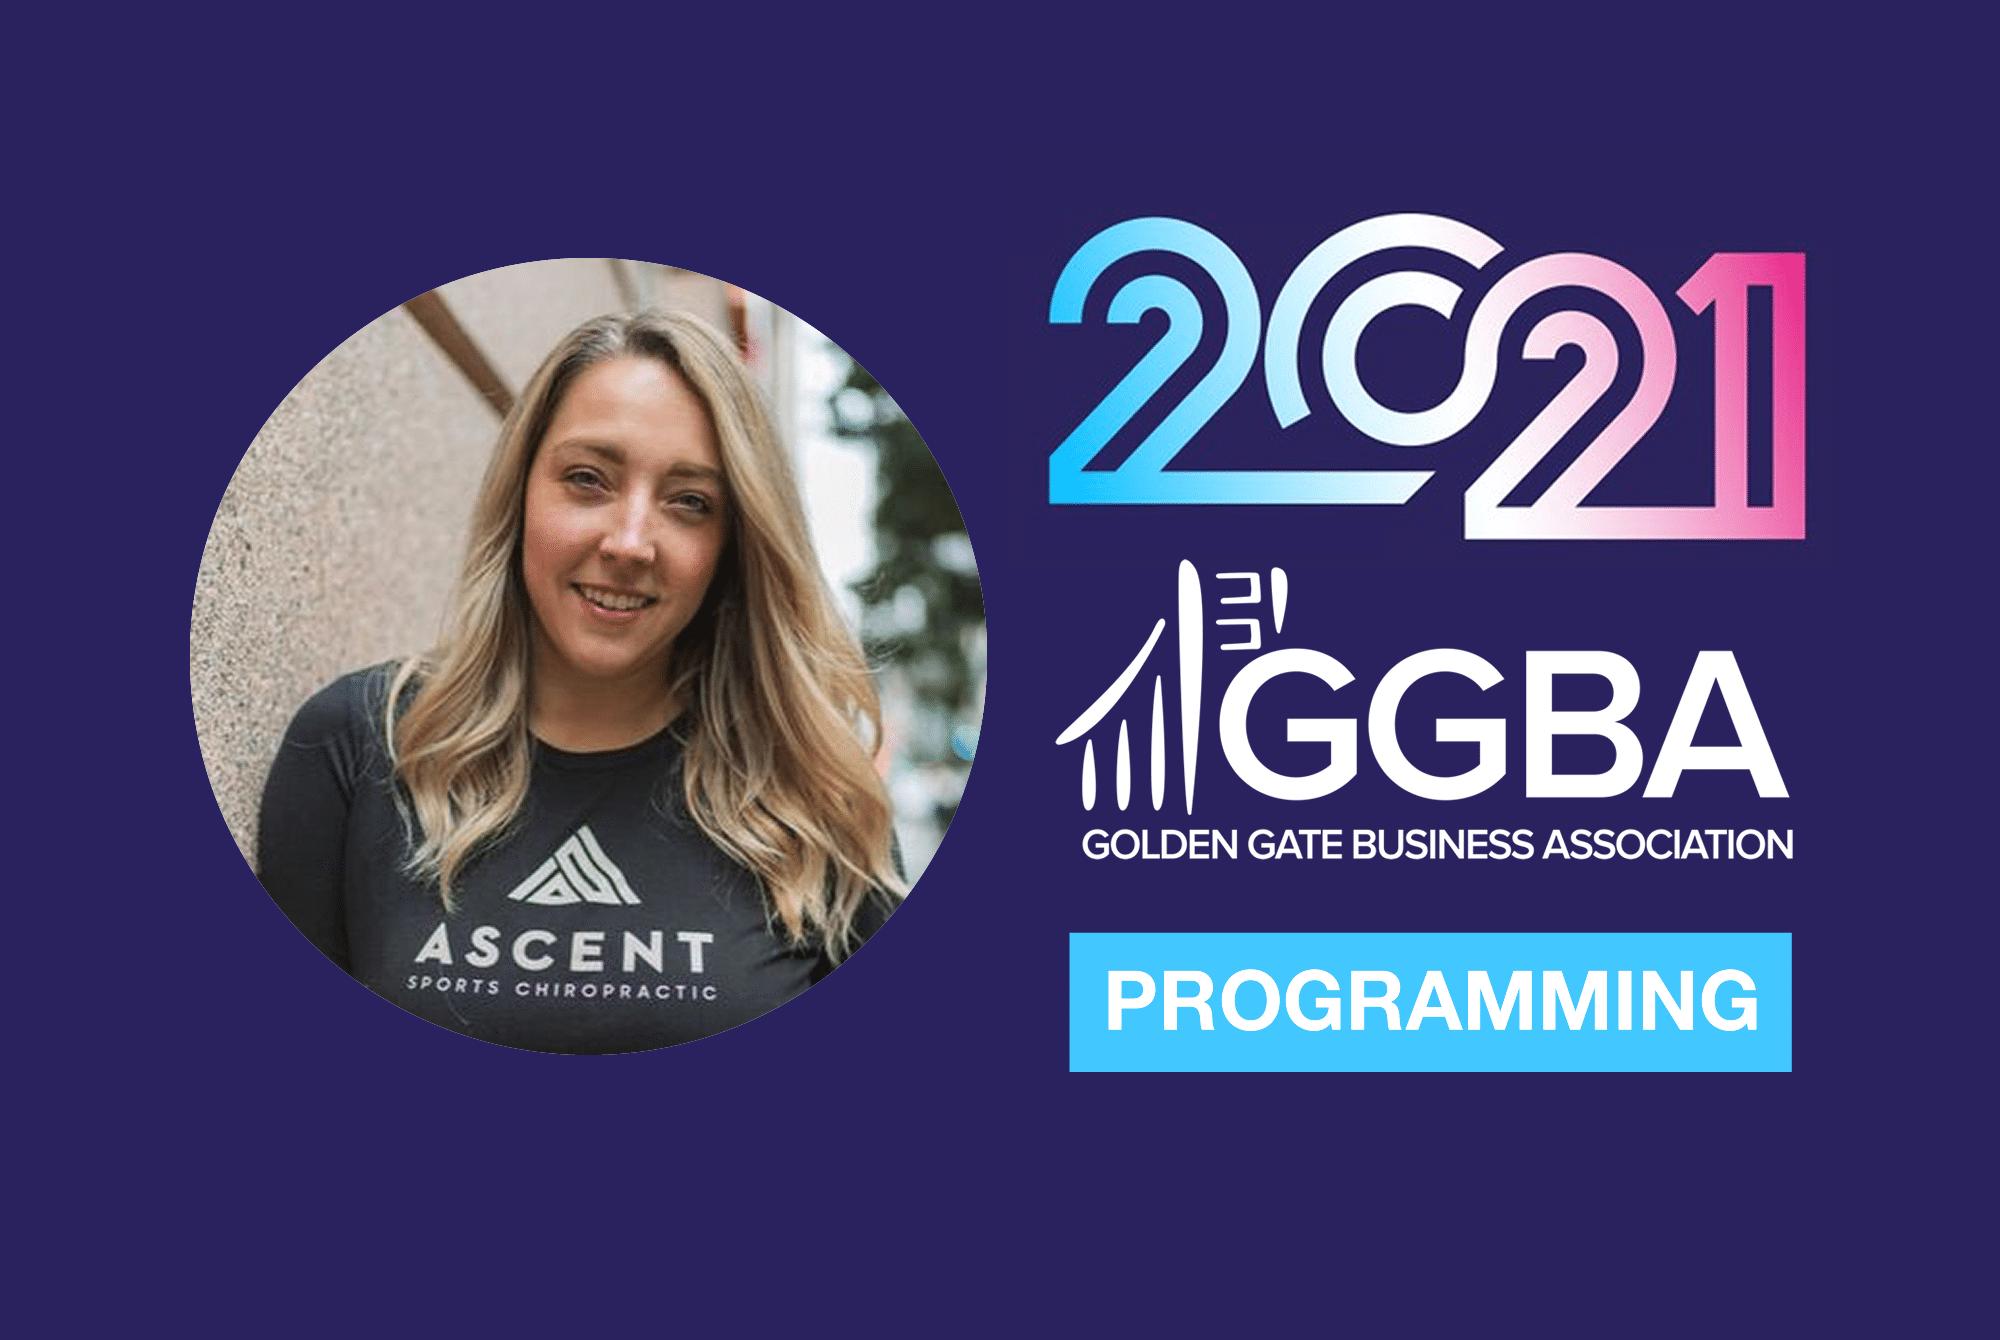 2021 GGBA Programming